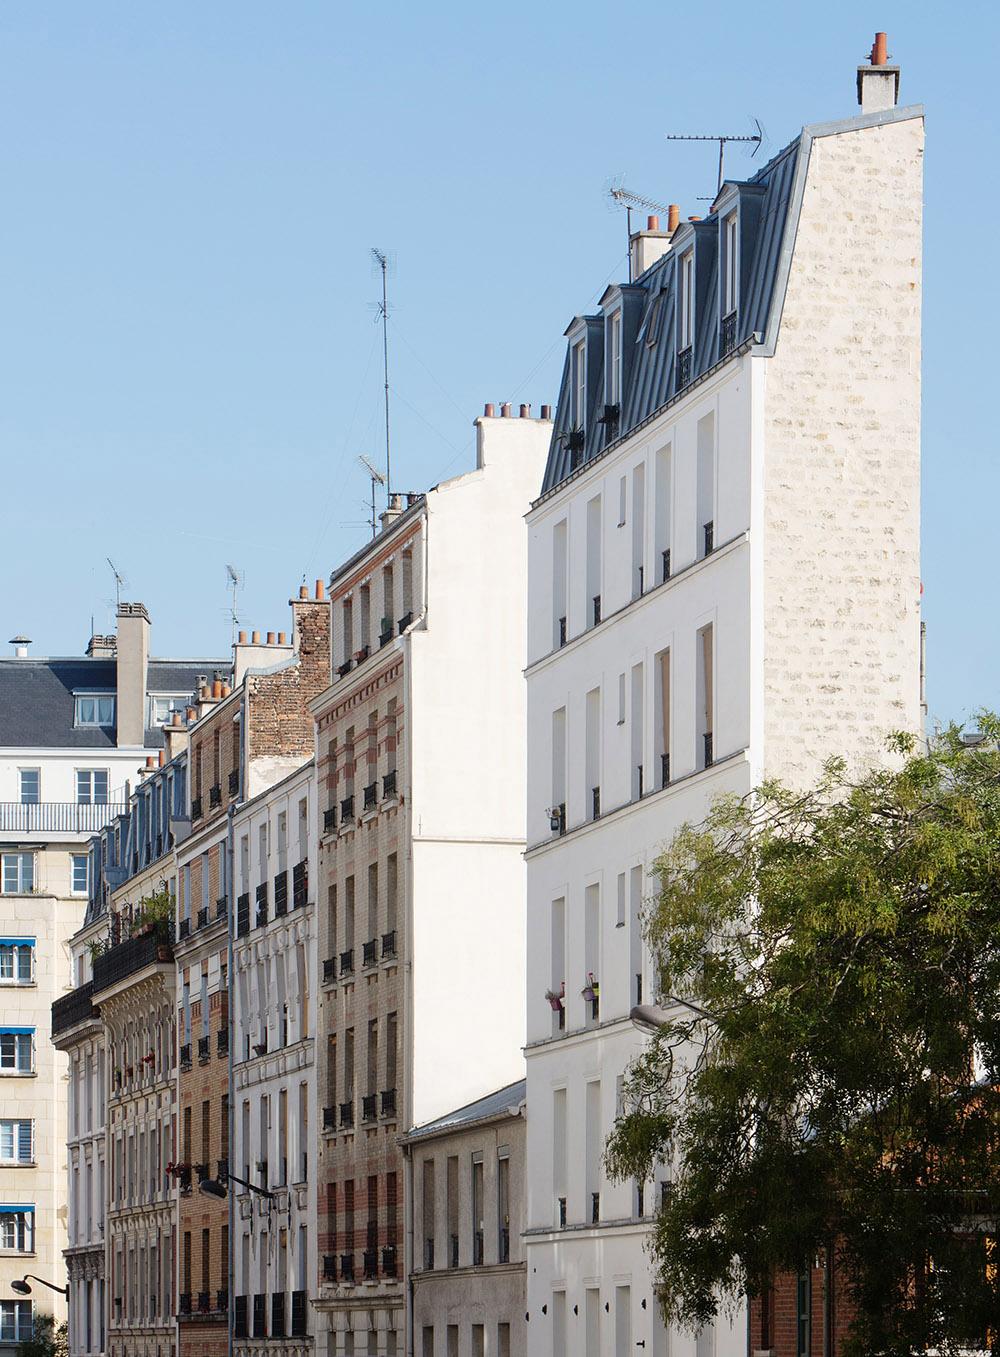 Rue-Louis-Braille-Credit-Mairie-Paris-Jean-Baptiste-Gurliat